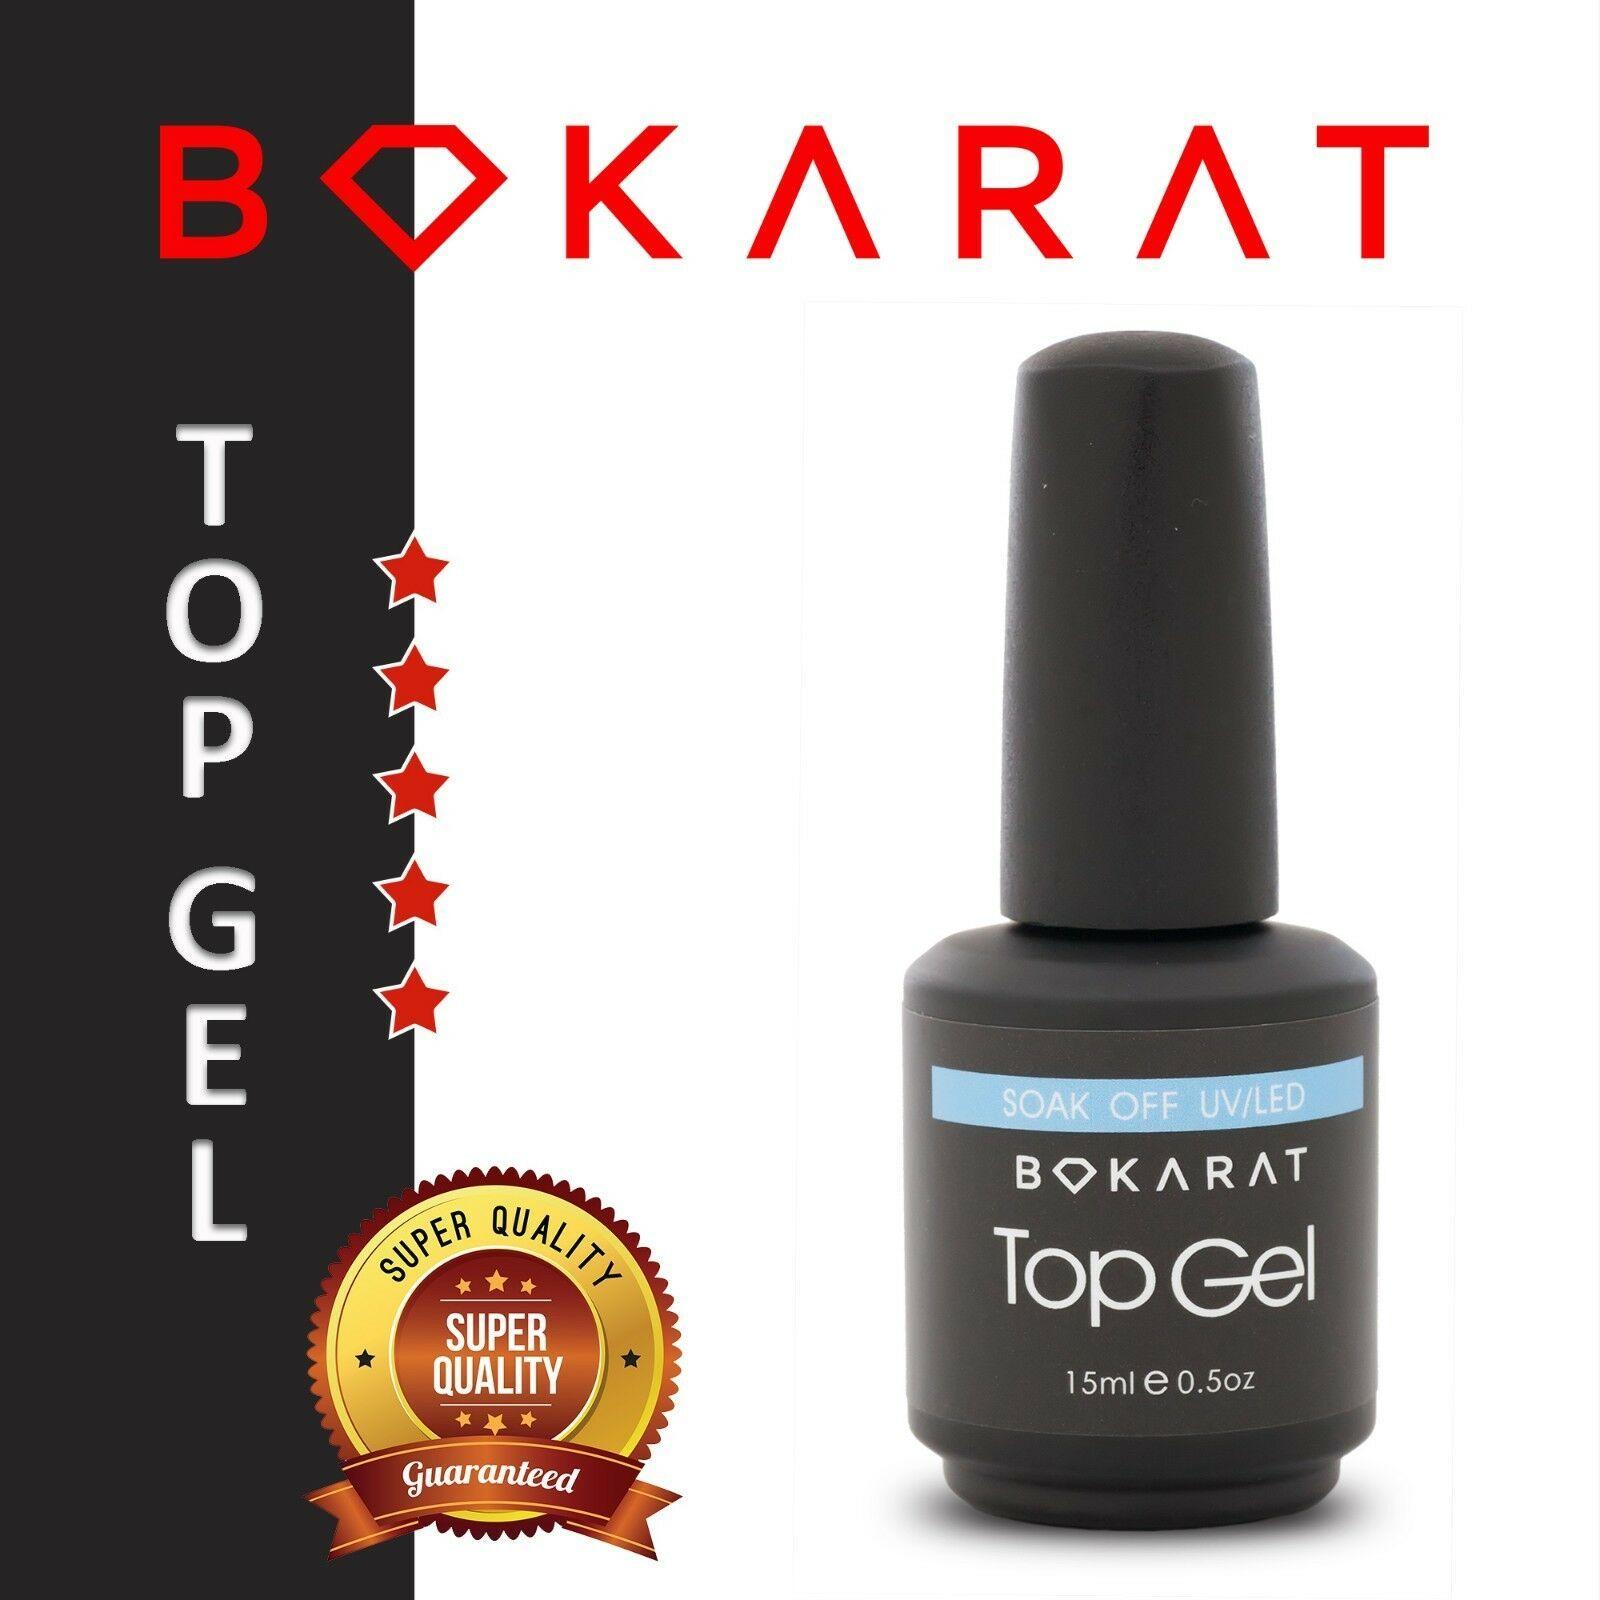 Bokarat No Wipe Top Coat Gel Nail Polish Soak Off for UV / LED Lamp, Thick, 15ml